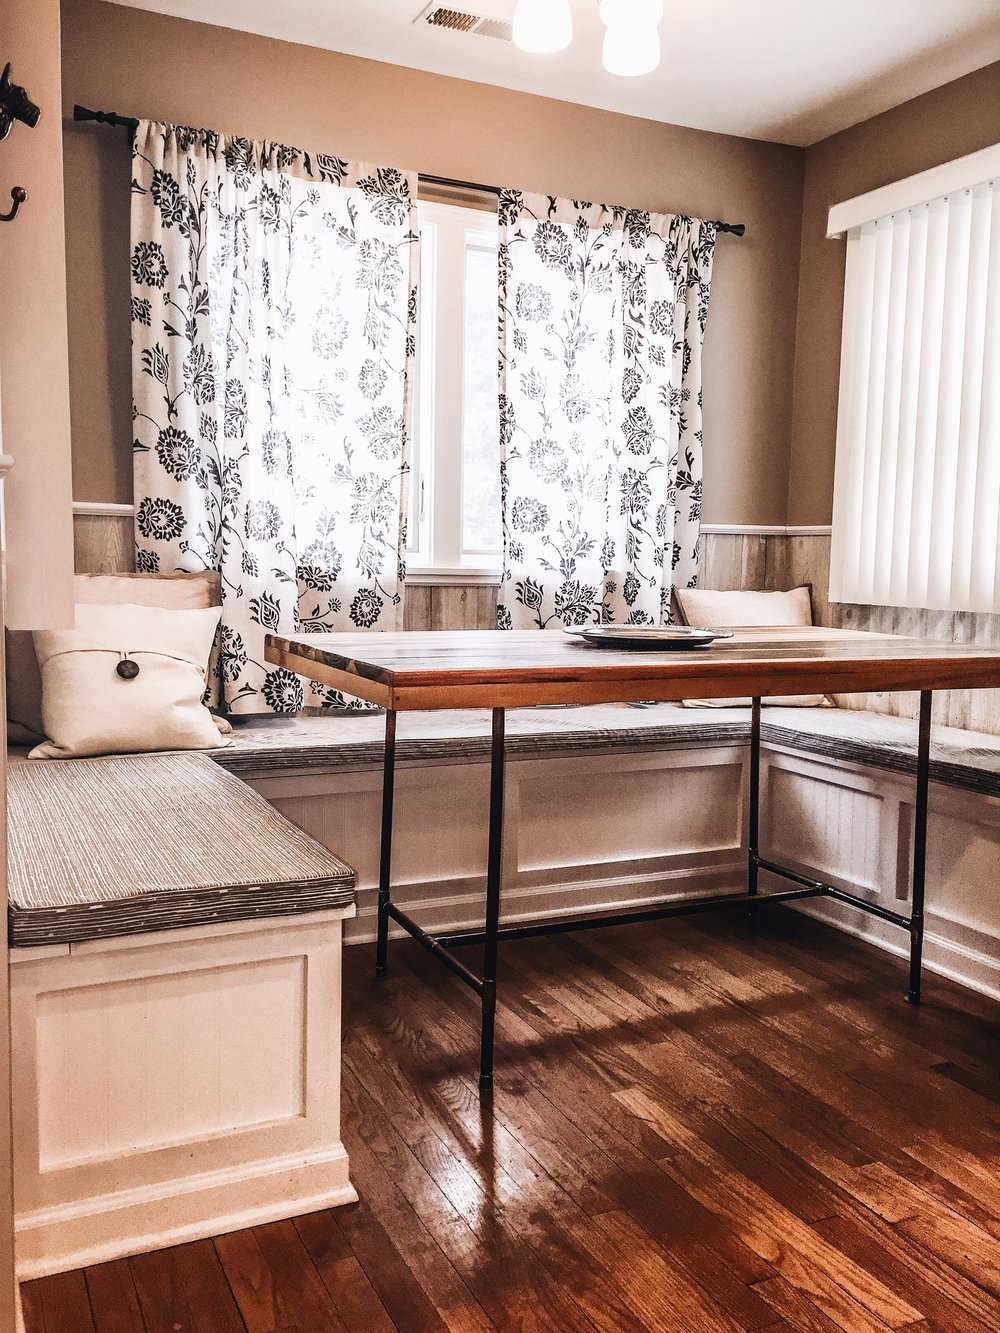 DIY Breakfast Nook with under cabinet storage option - First Thyme Mom